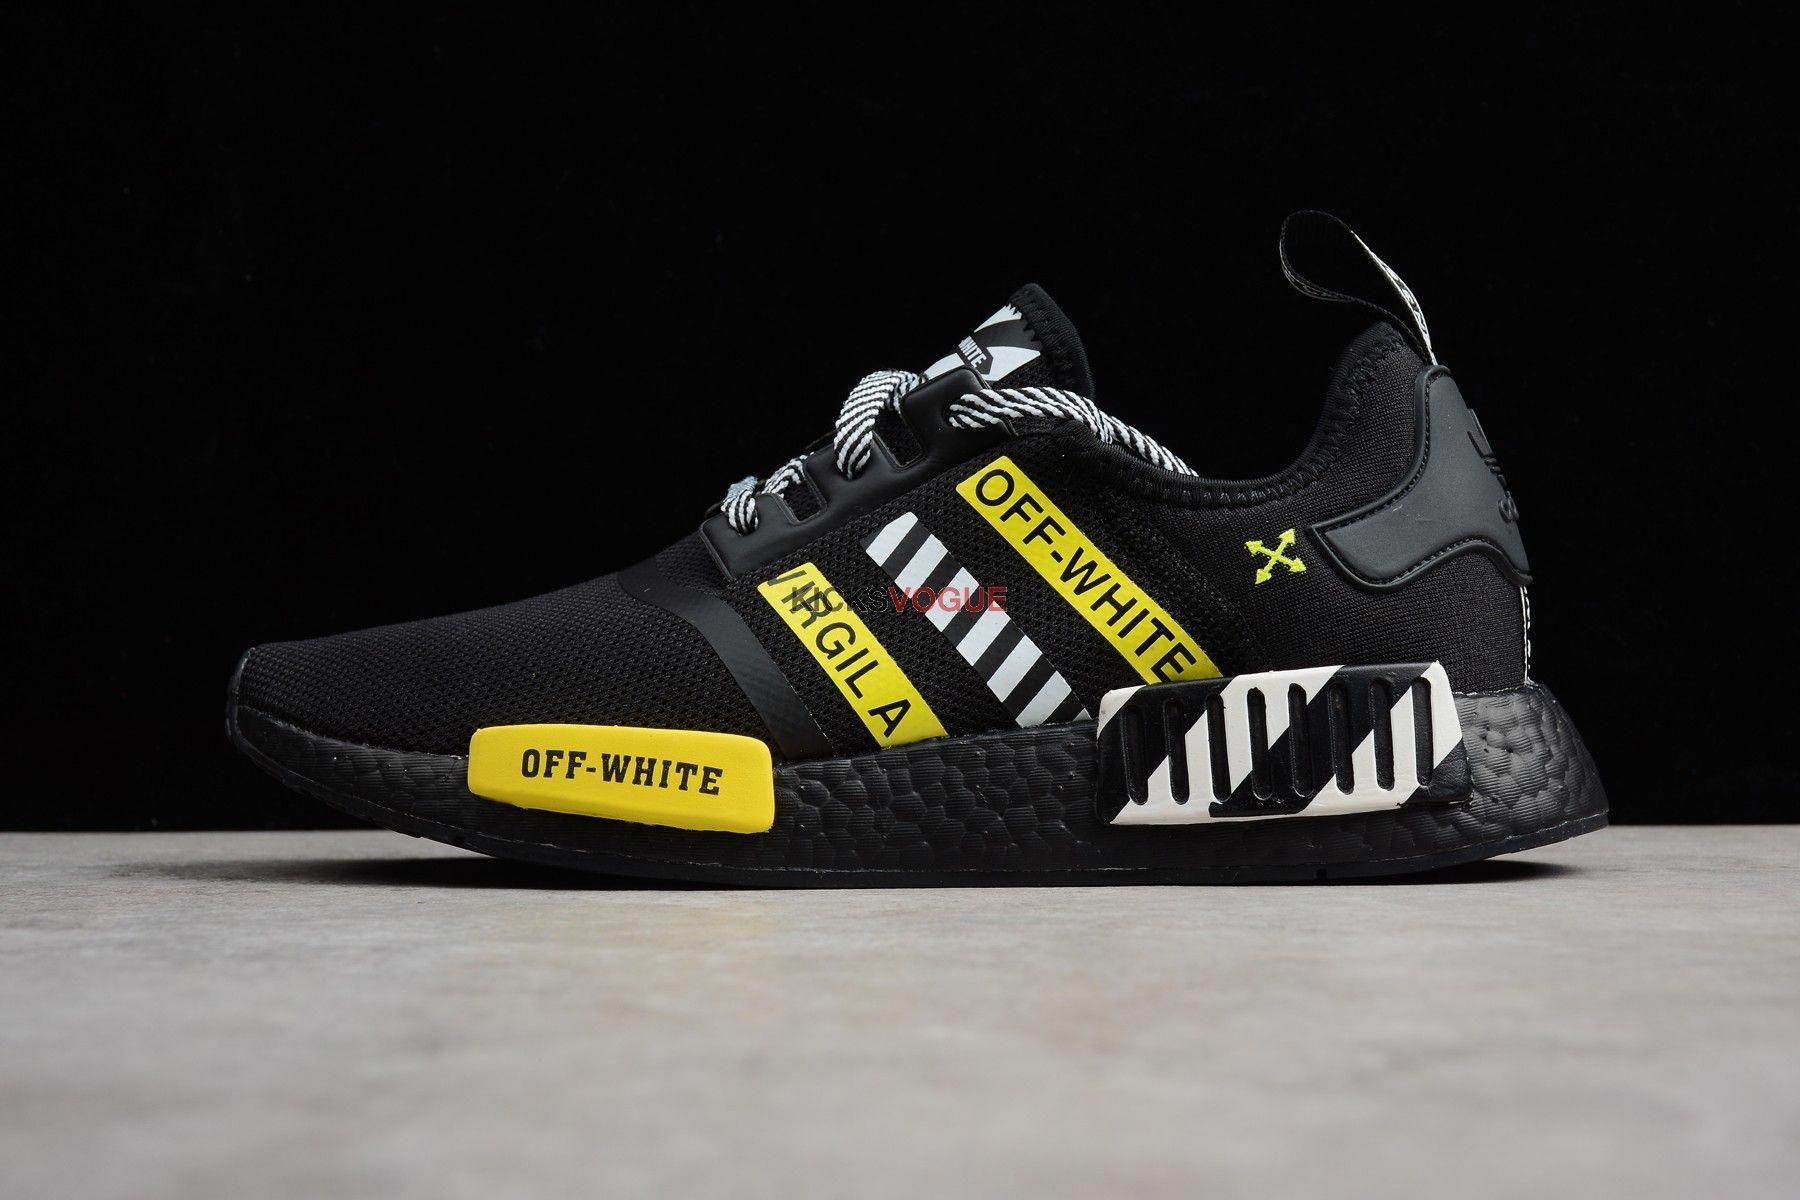 OFF WHITE x ADIDAS NMD_R1 | Adidas nmd r1, Adidas nmd, Nmd r1